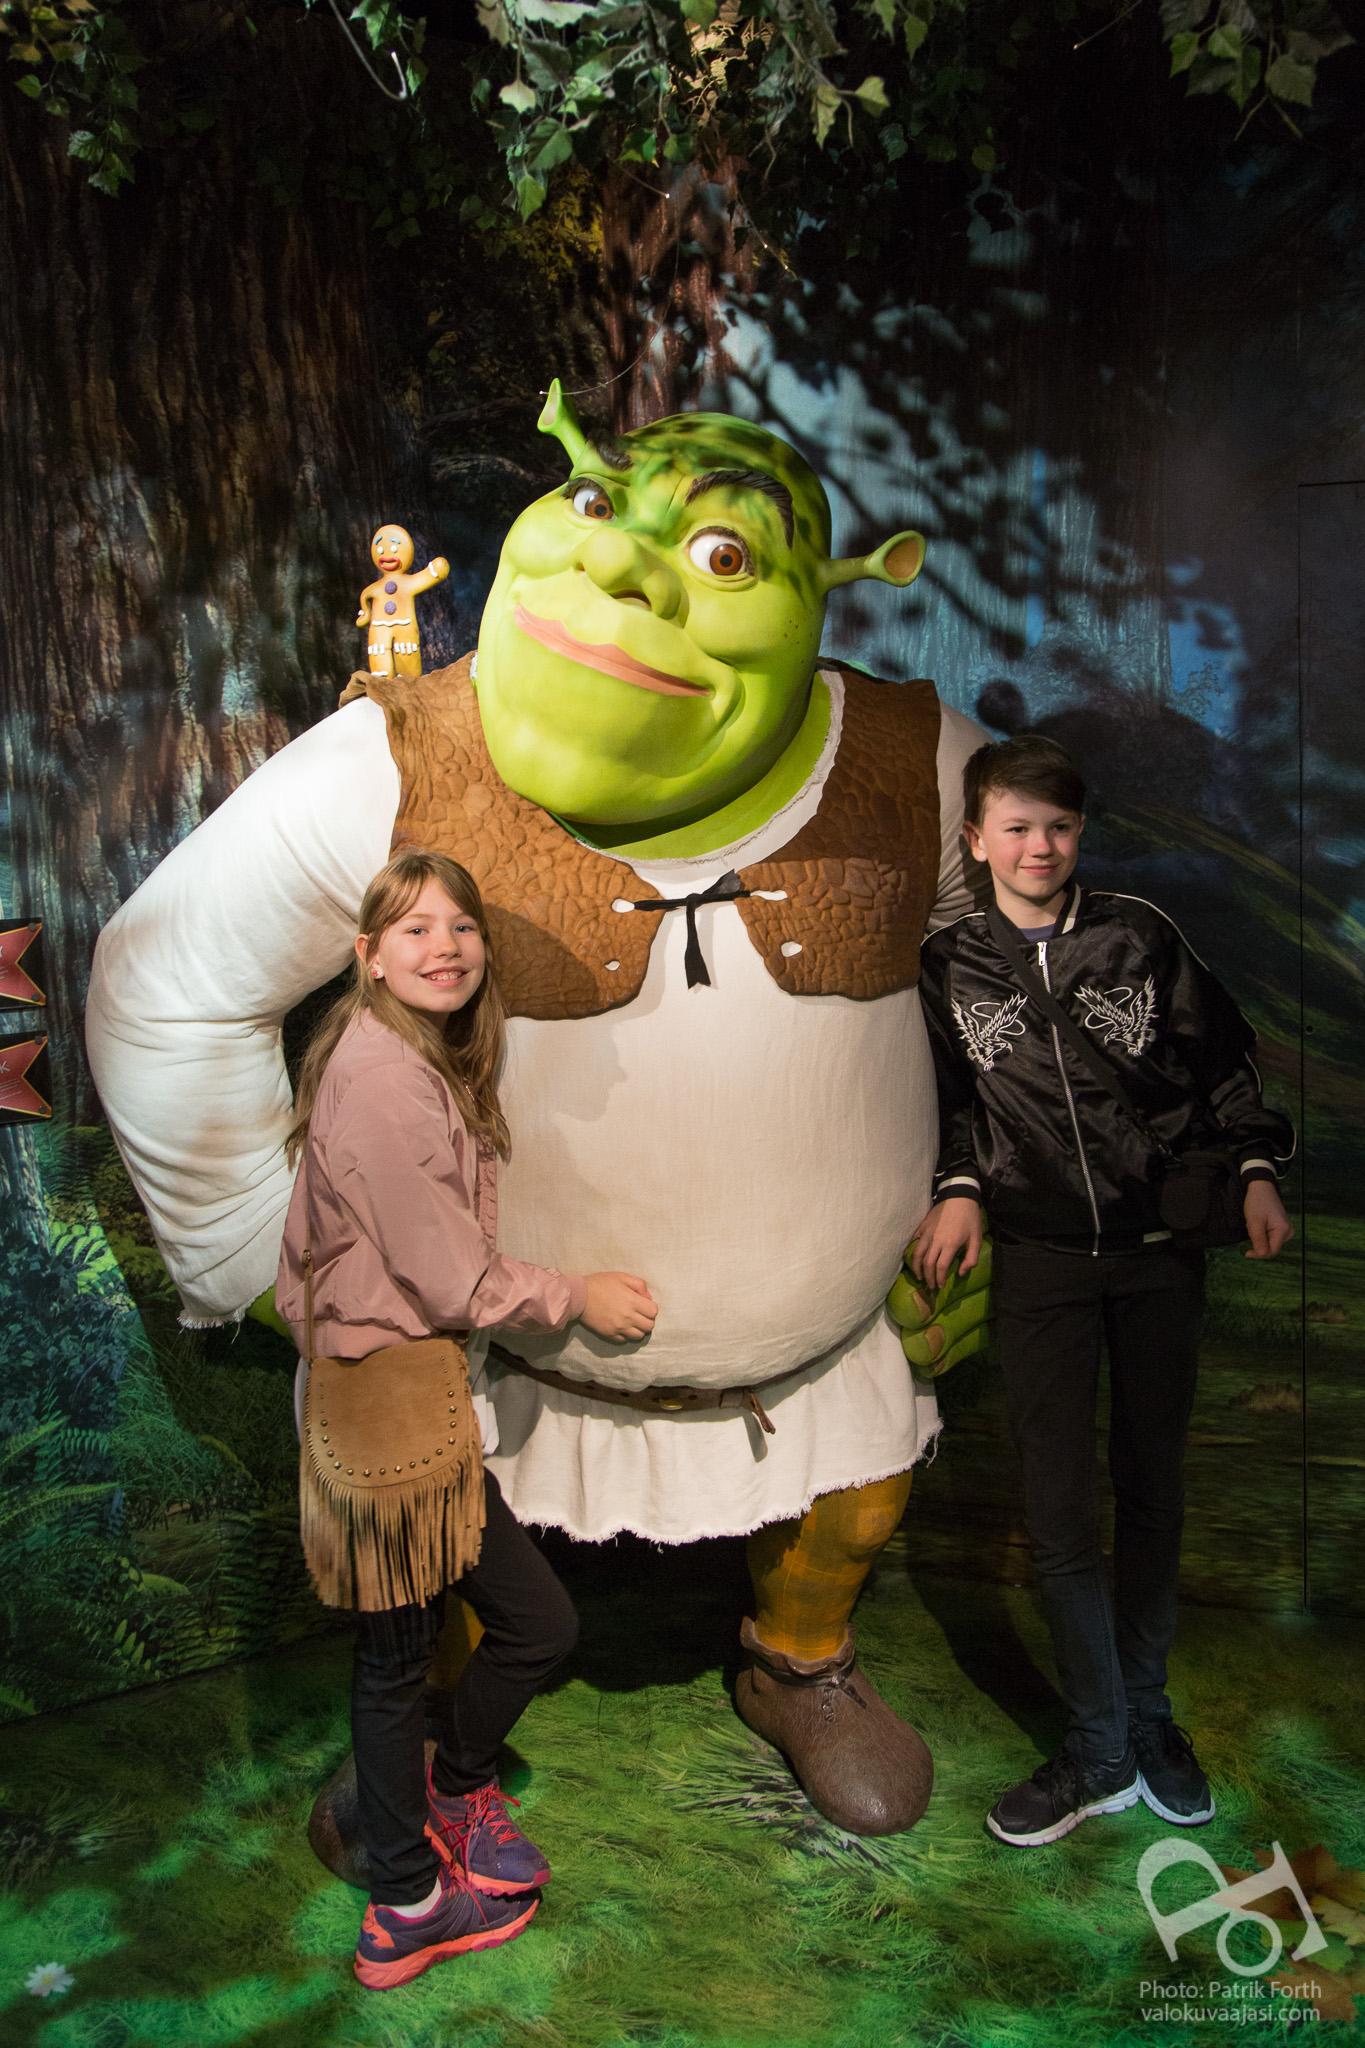 Madame Tussauds - Shrek & Gingerbread man